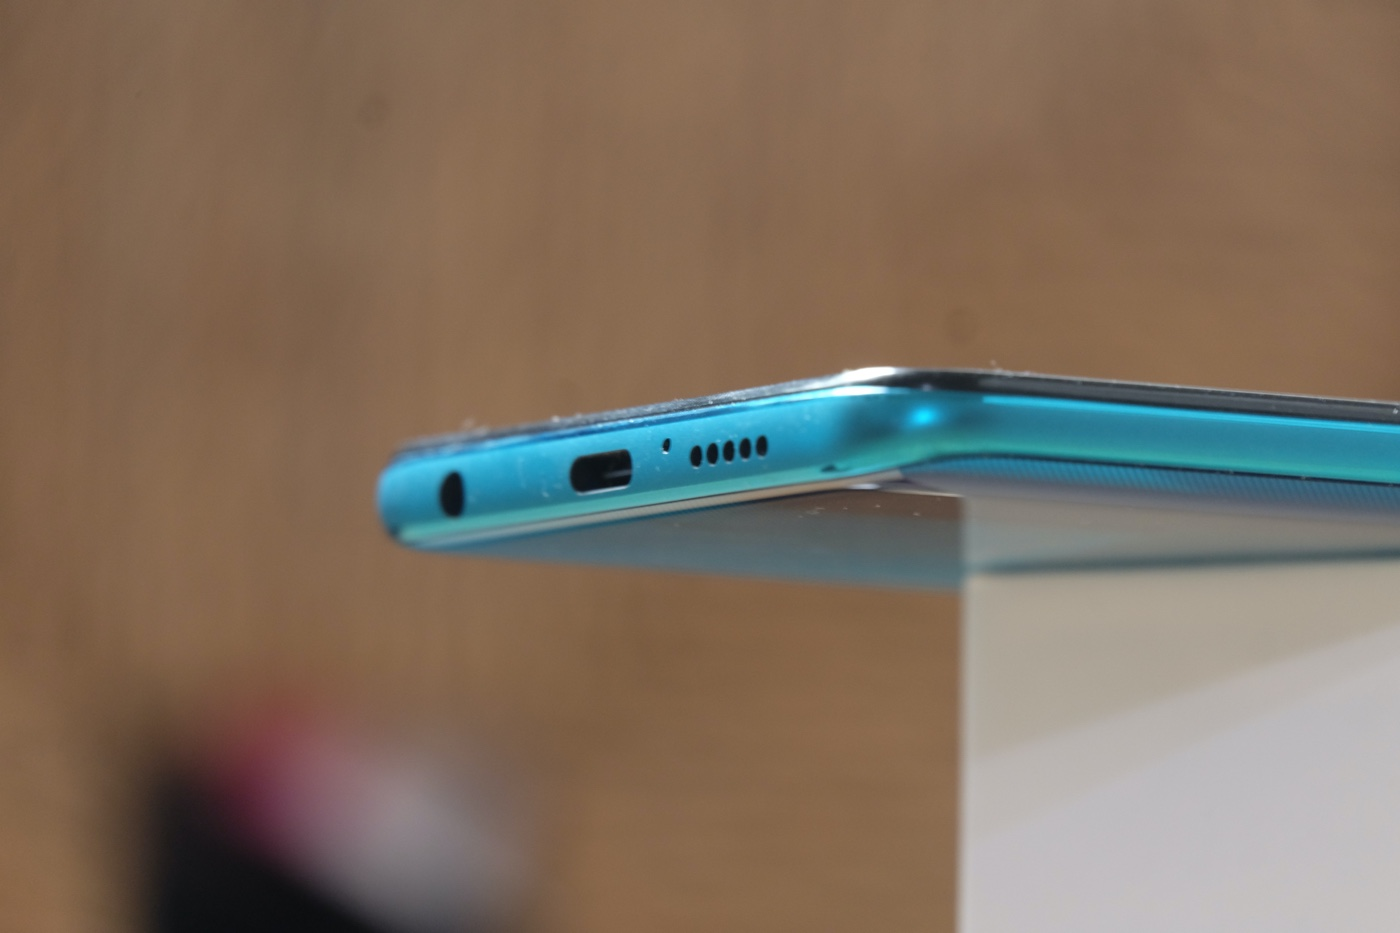 Xiaomi Redmi Note 9 Pro recharge test